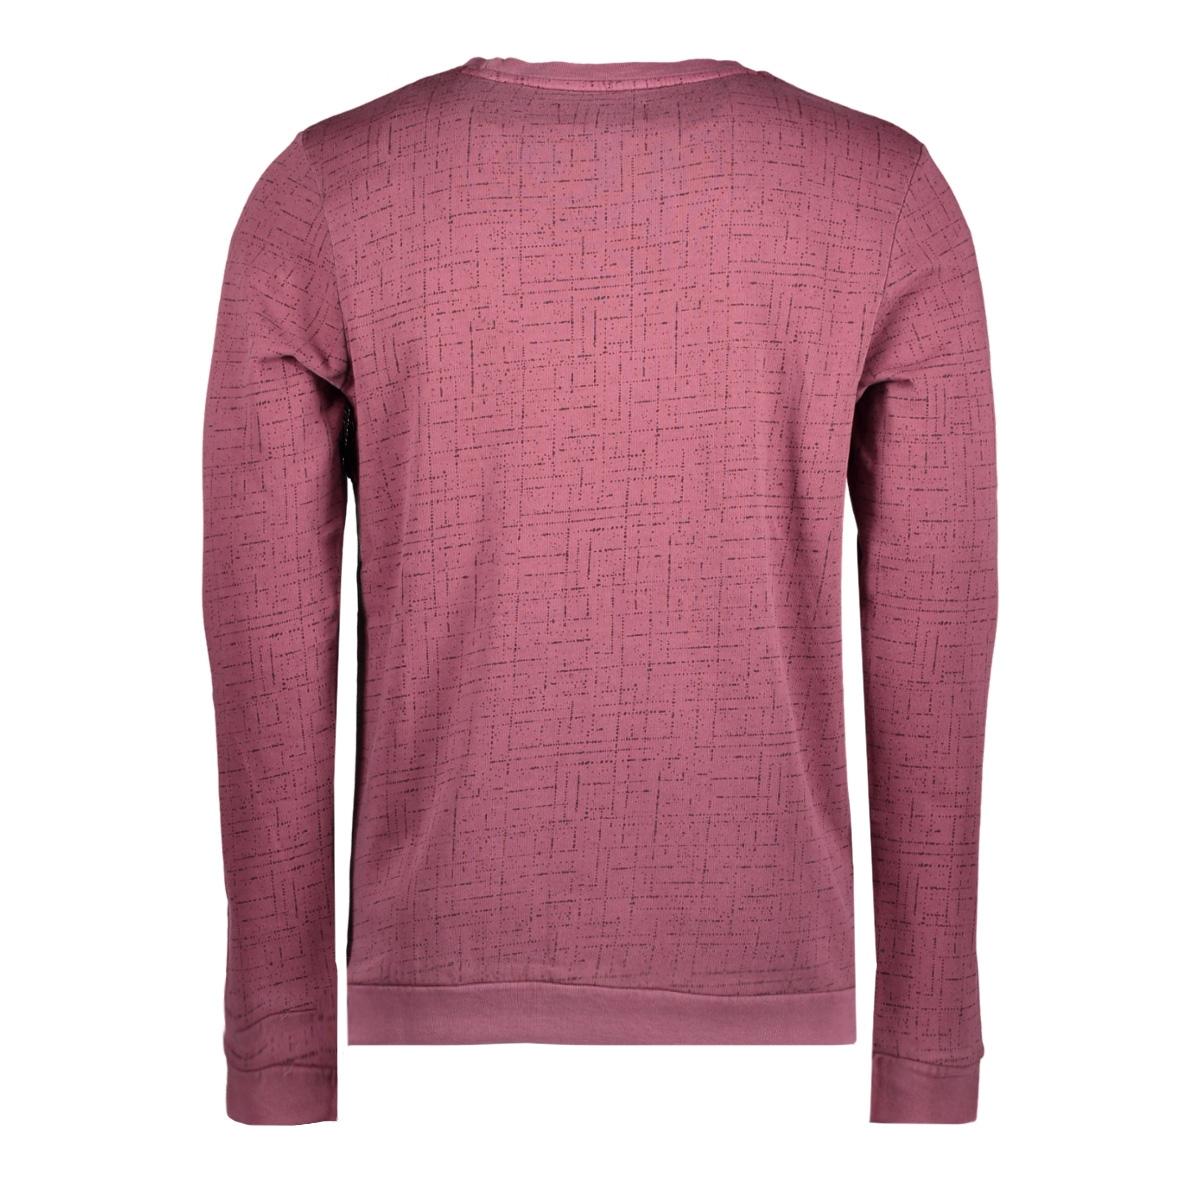 2555211.00.12 tom tailor sweater 4257